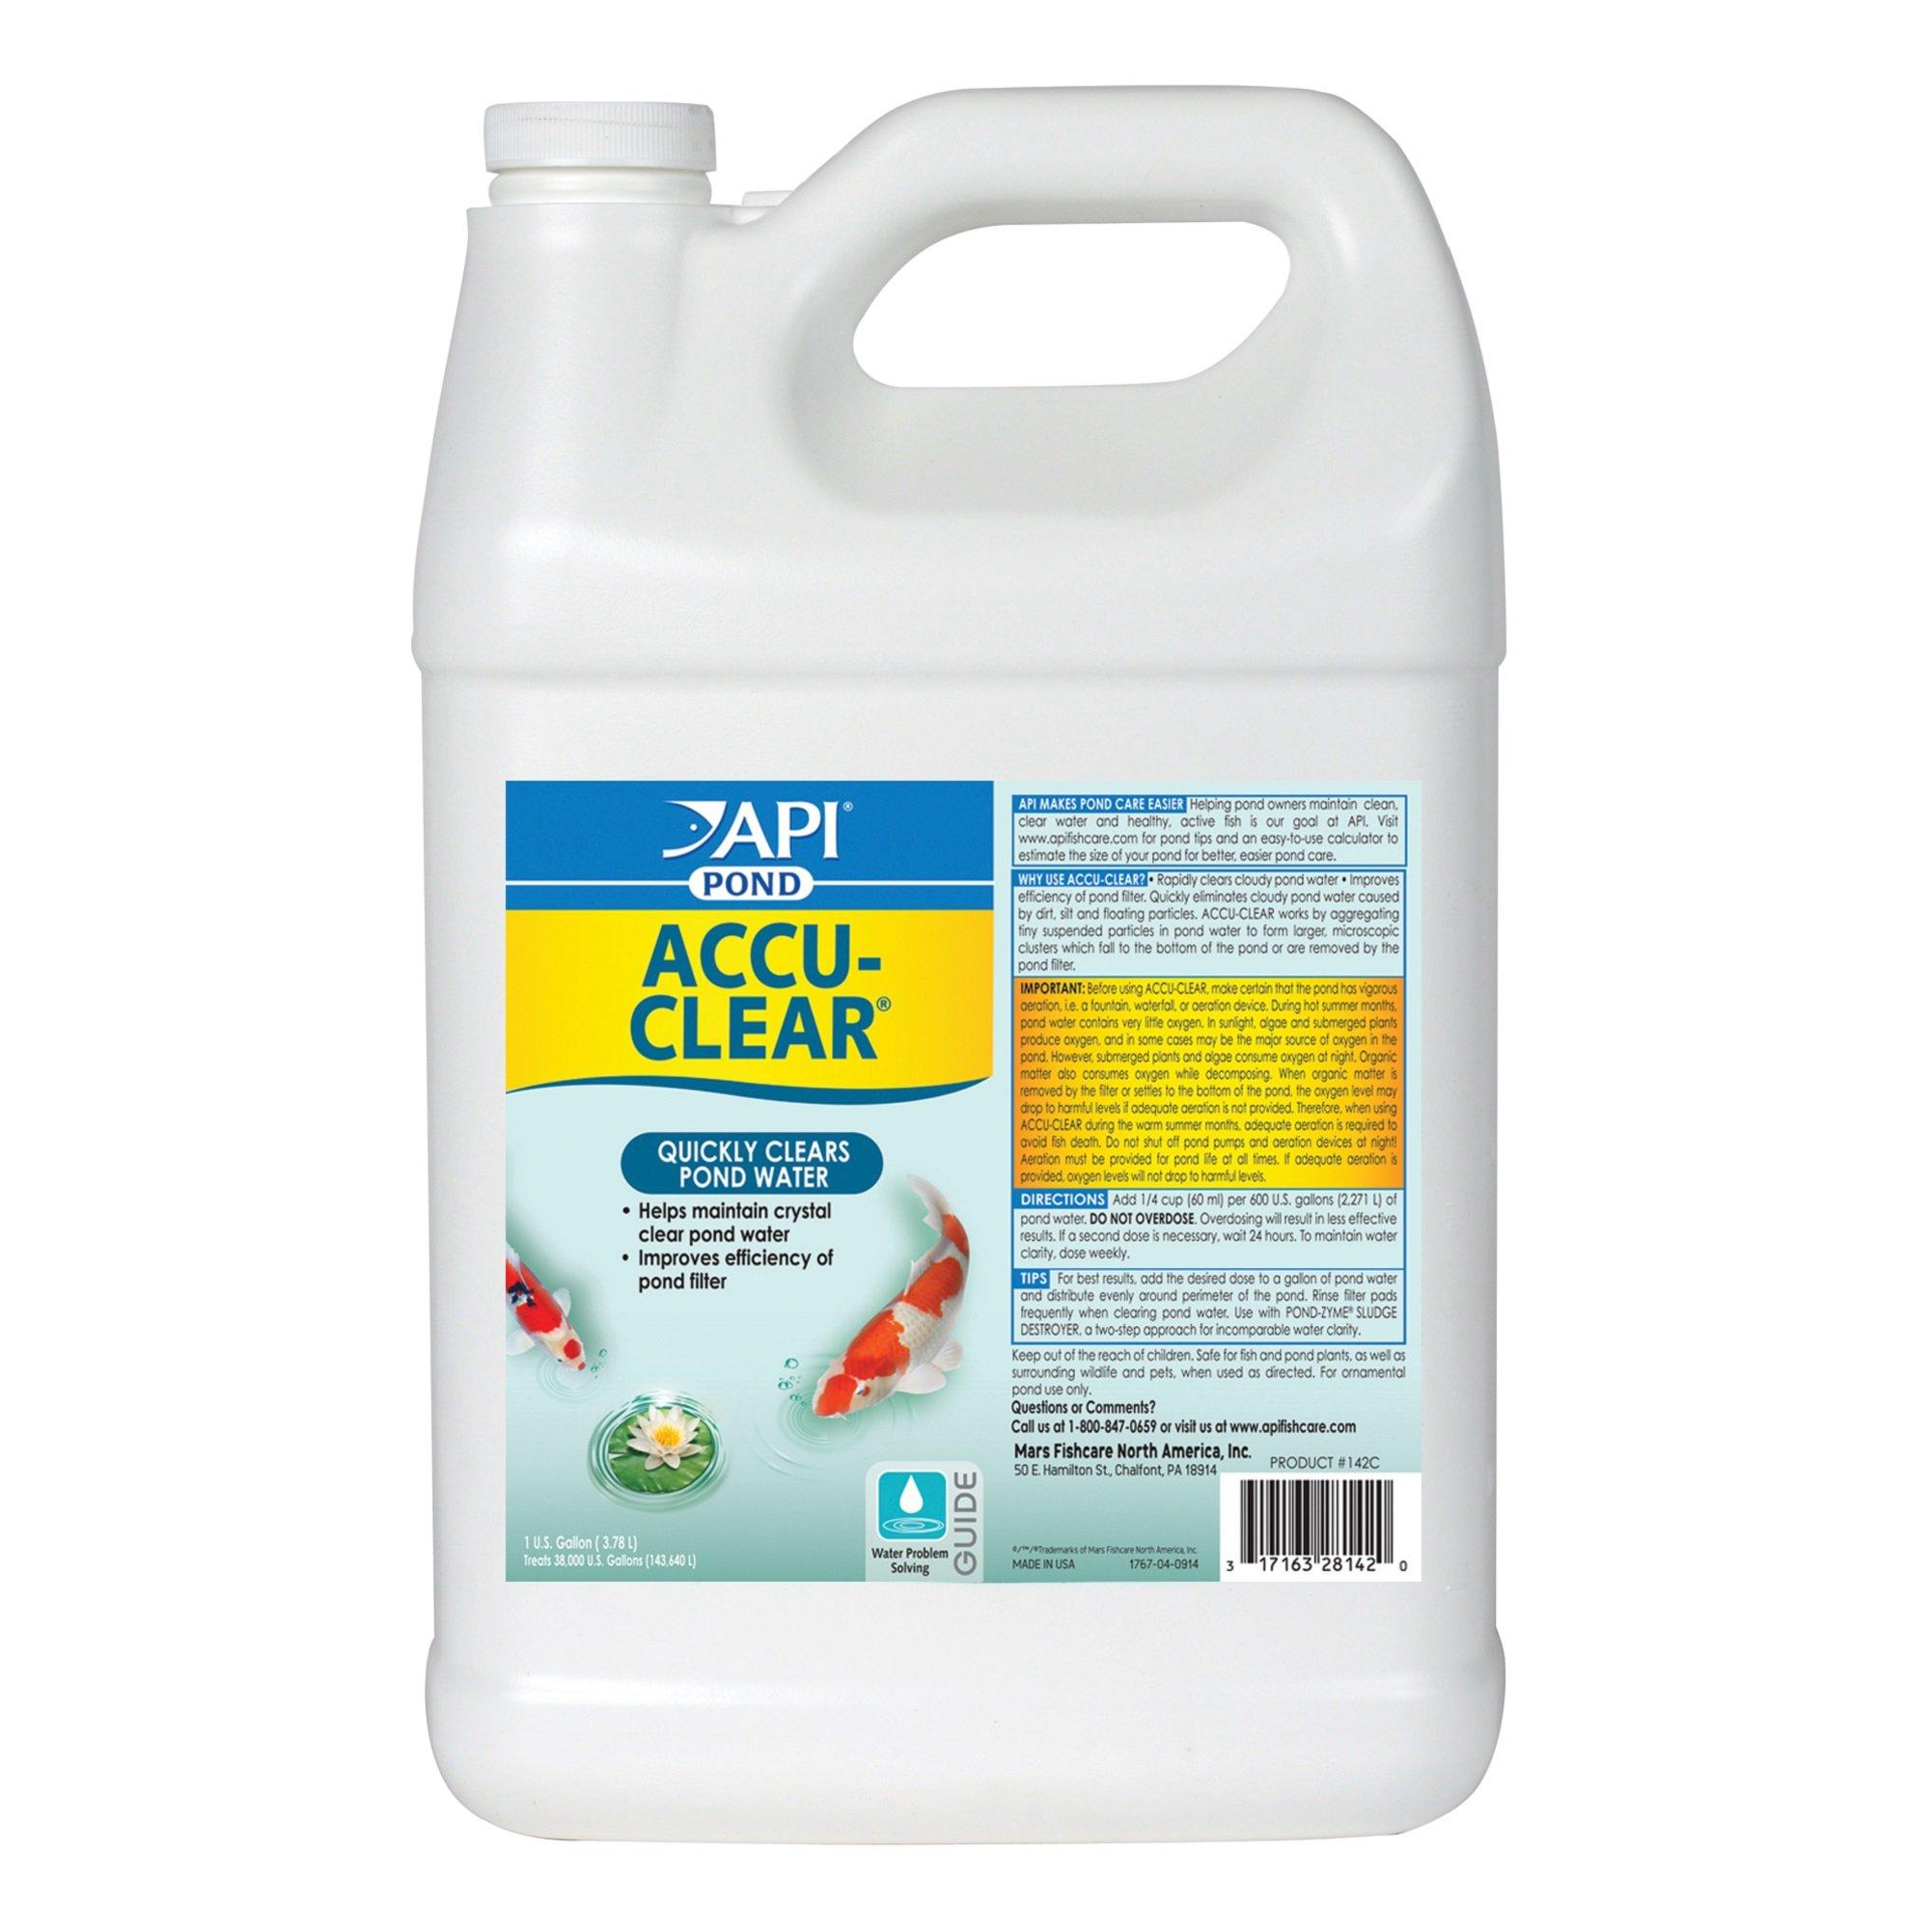 API POND ACCU-CLEAR Pond Water Clarifier 1-Gallon Bottle